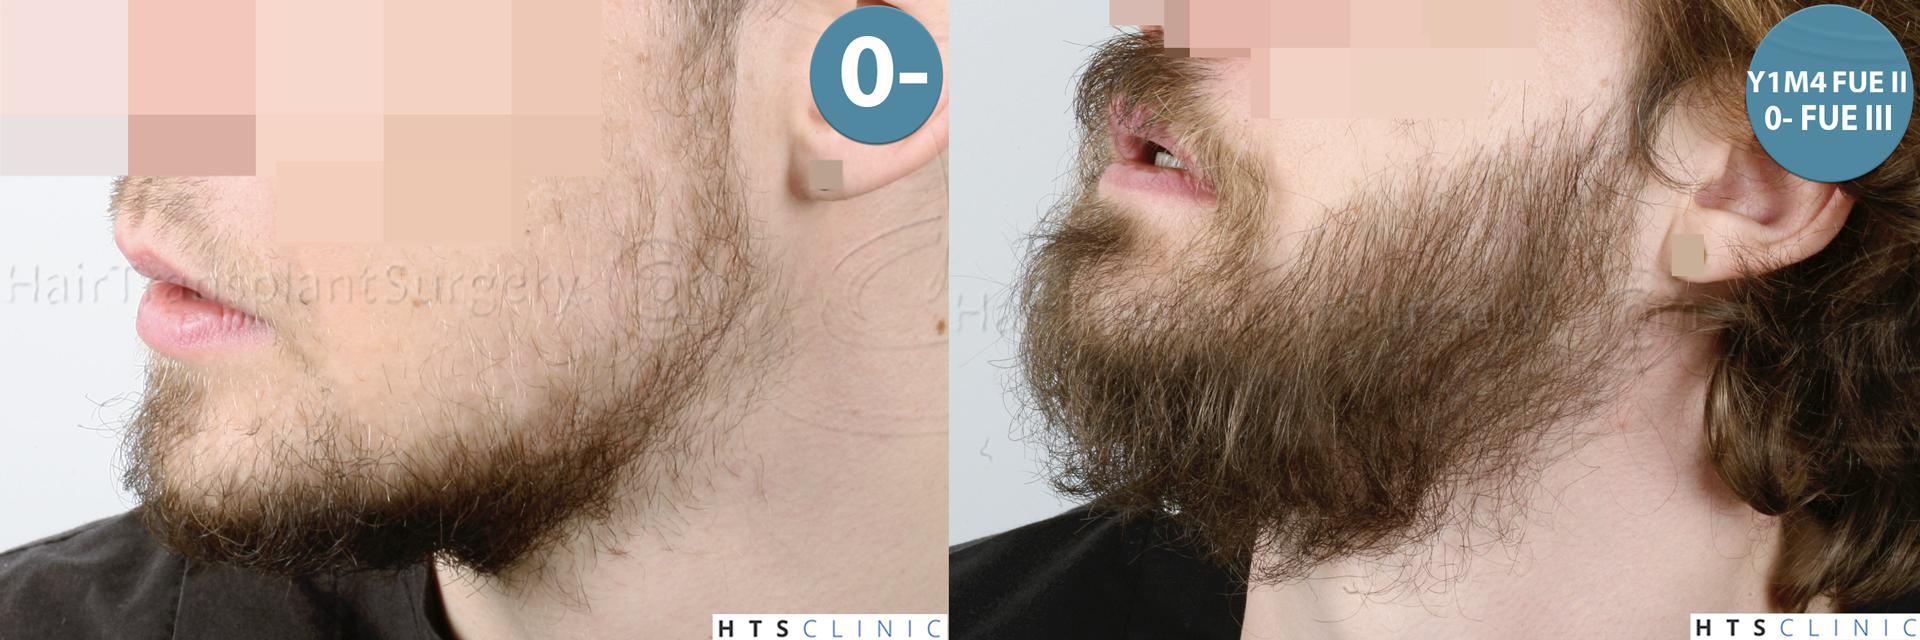 Dr.Devroye-HTS-Clinic-6132-_2011_1232_2889_-FUE-Barbe-et-cheveux-Montage2.jpg